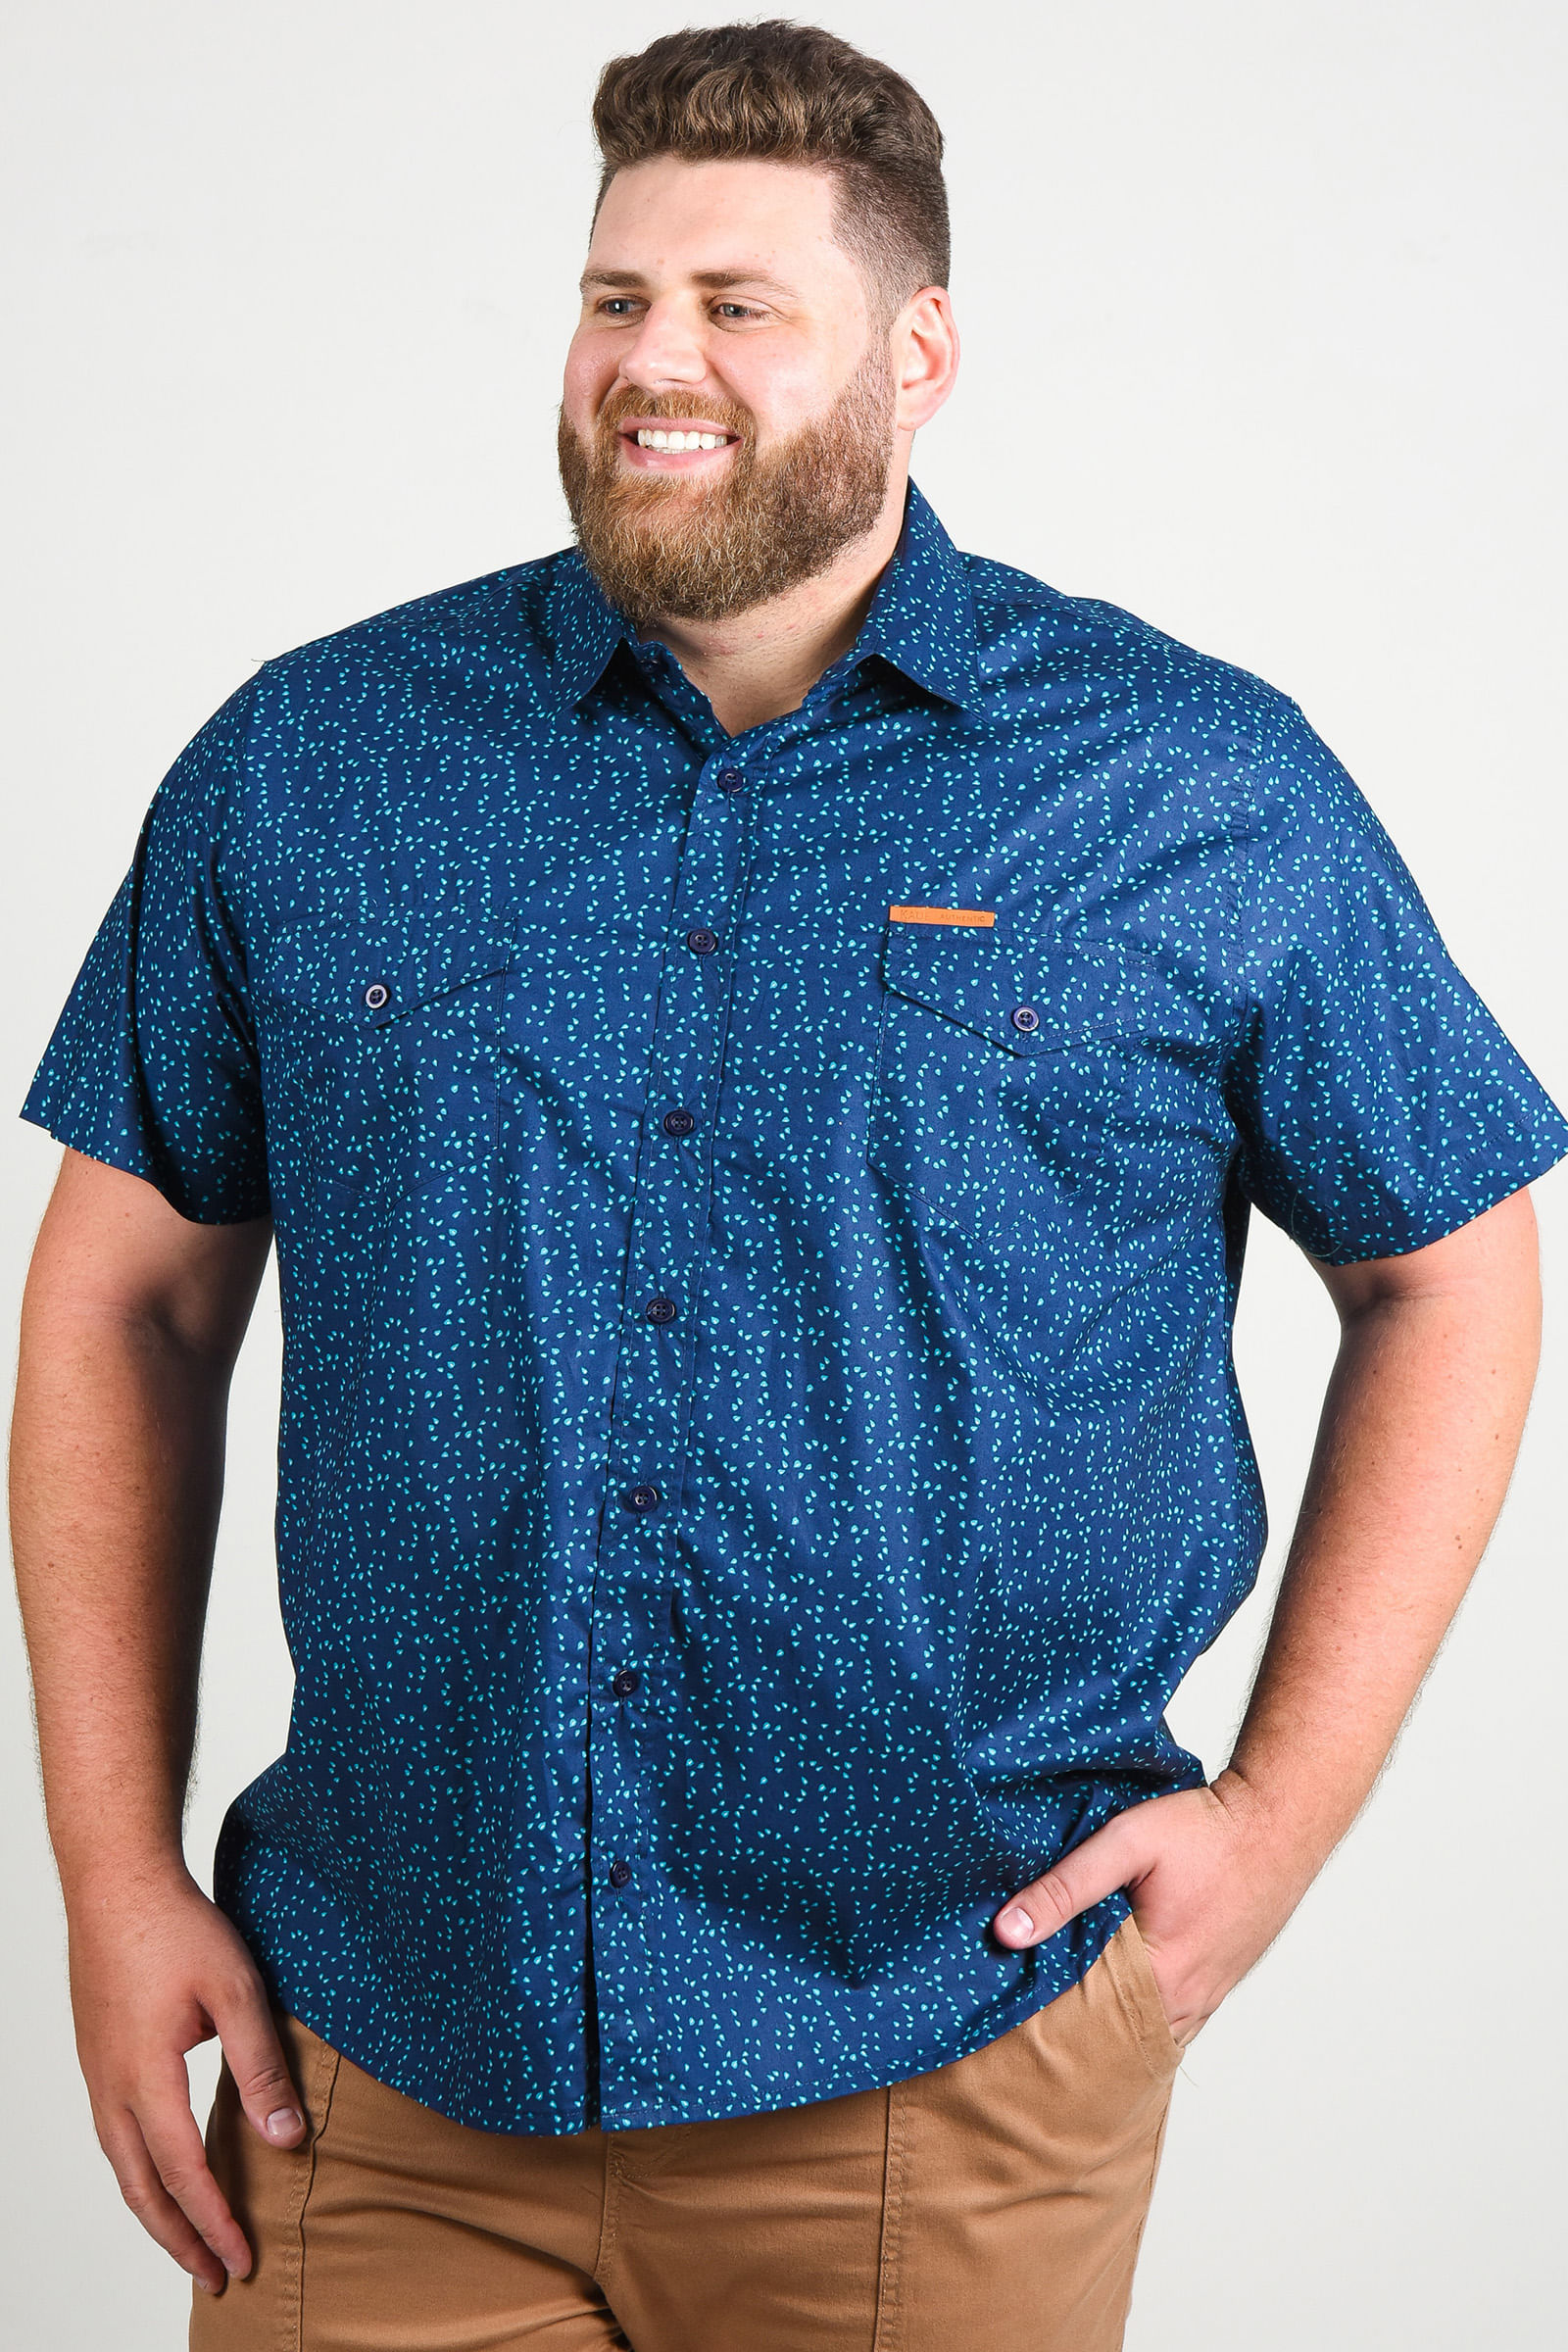 Camisa estampada manga curta plus size azul marinho